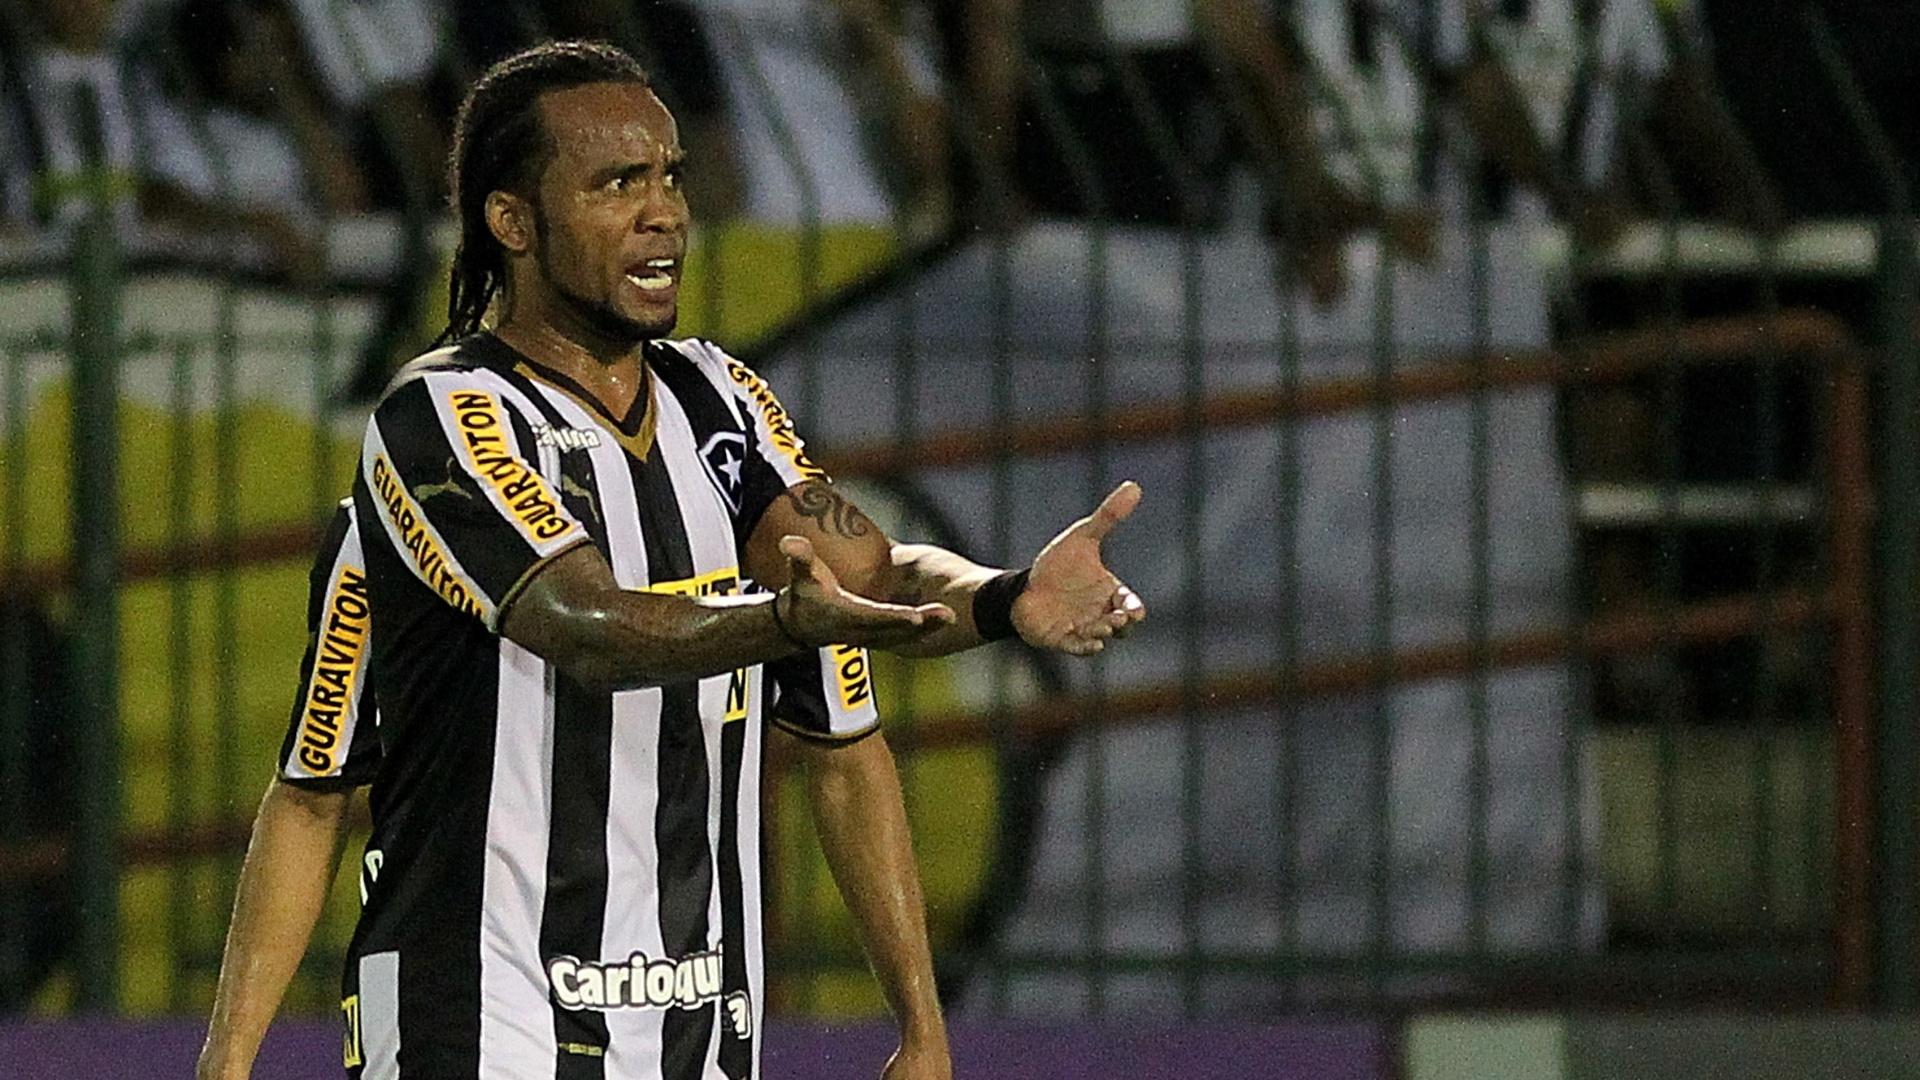 Carlos Alberto reclama durante jogo entre Botafogo x Atlético-PR, no Raulino de Oliveira, em Vollta Redonda